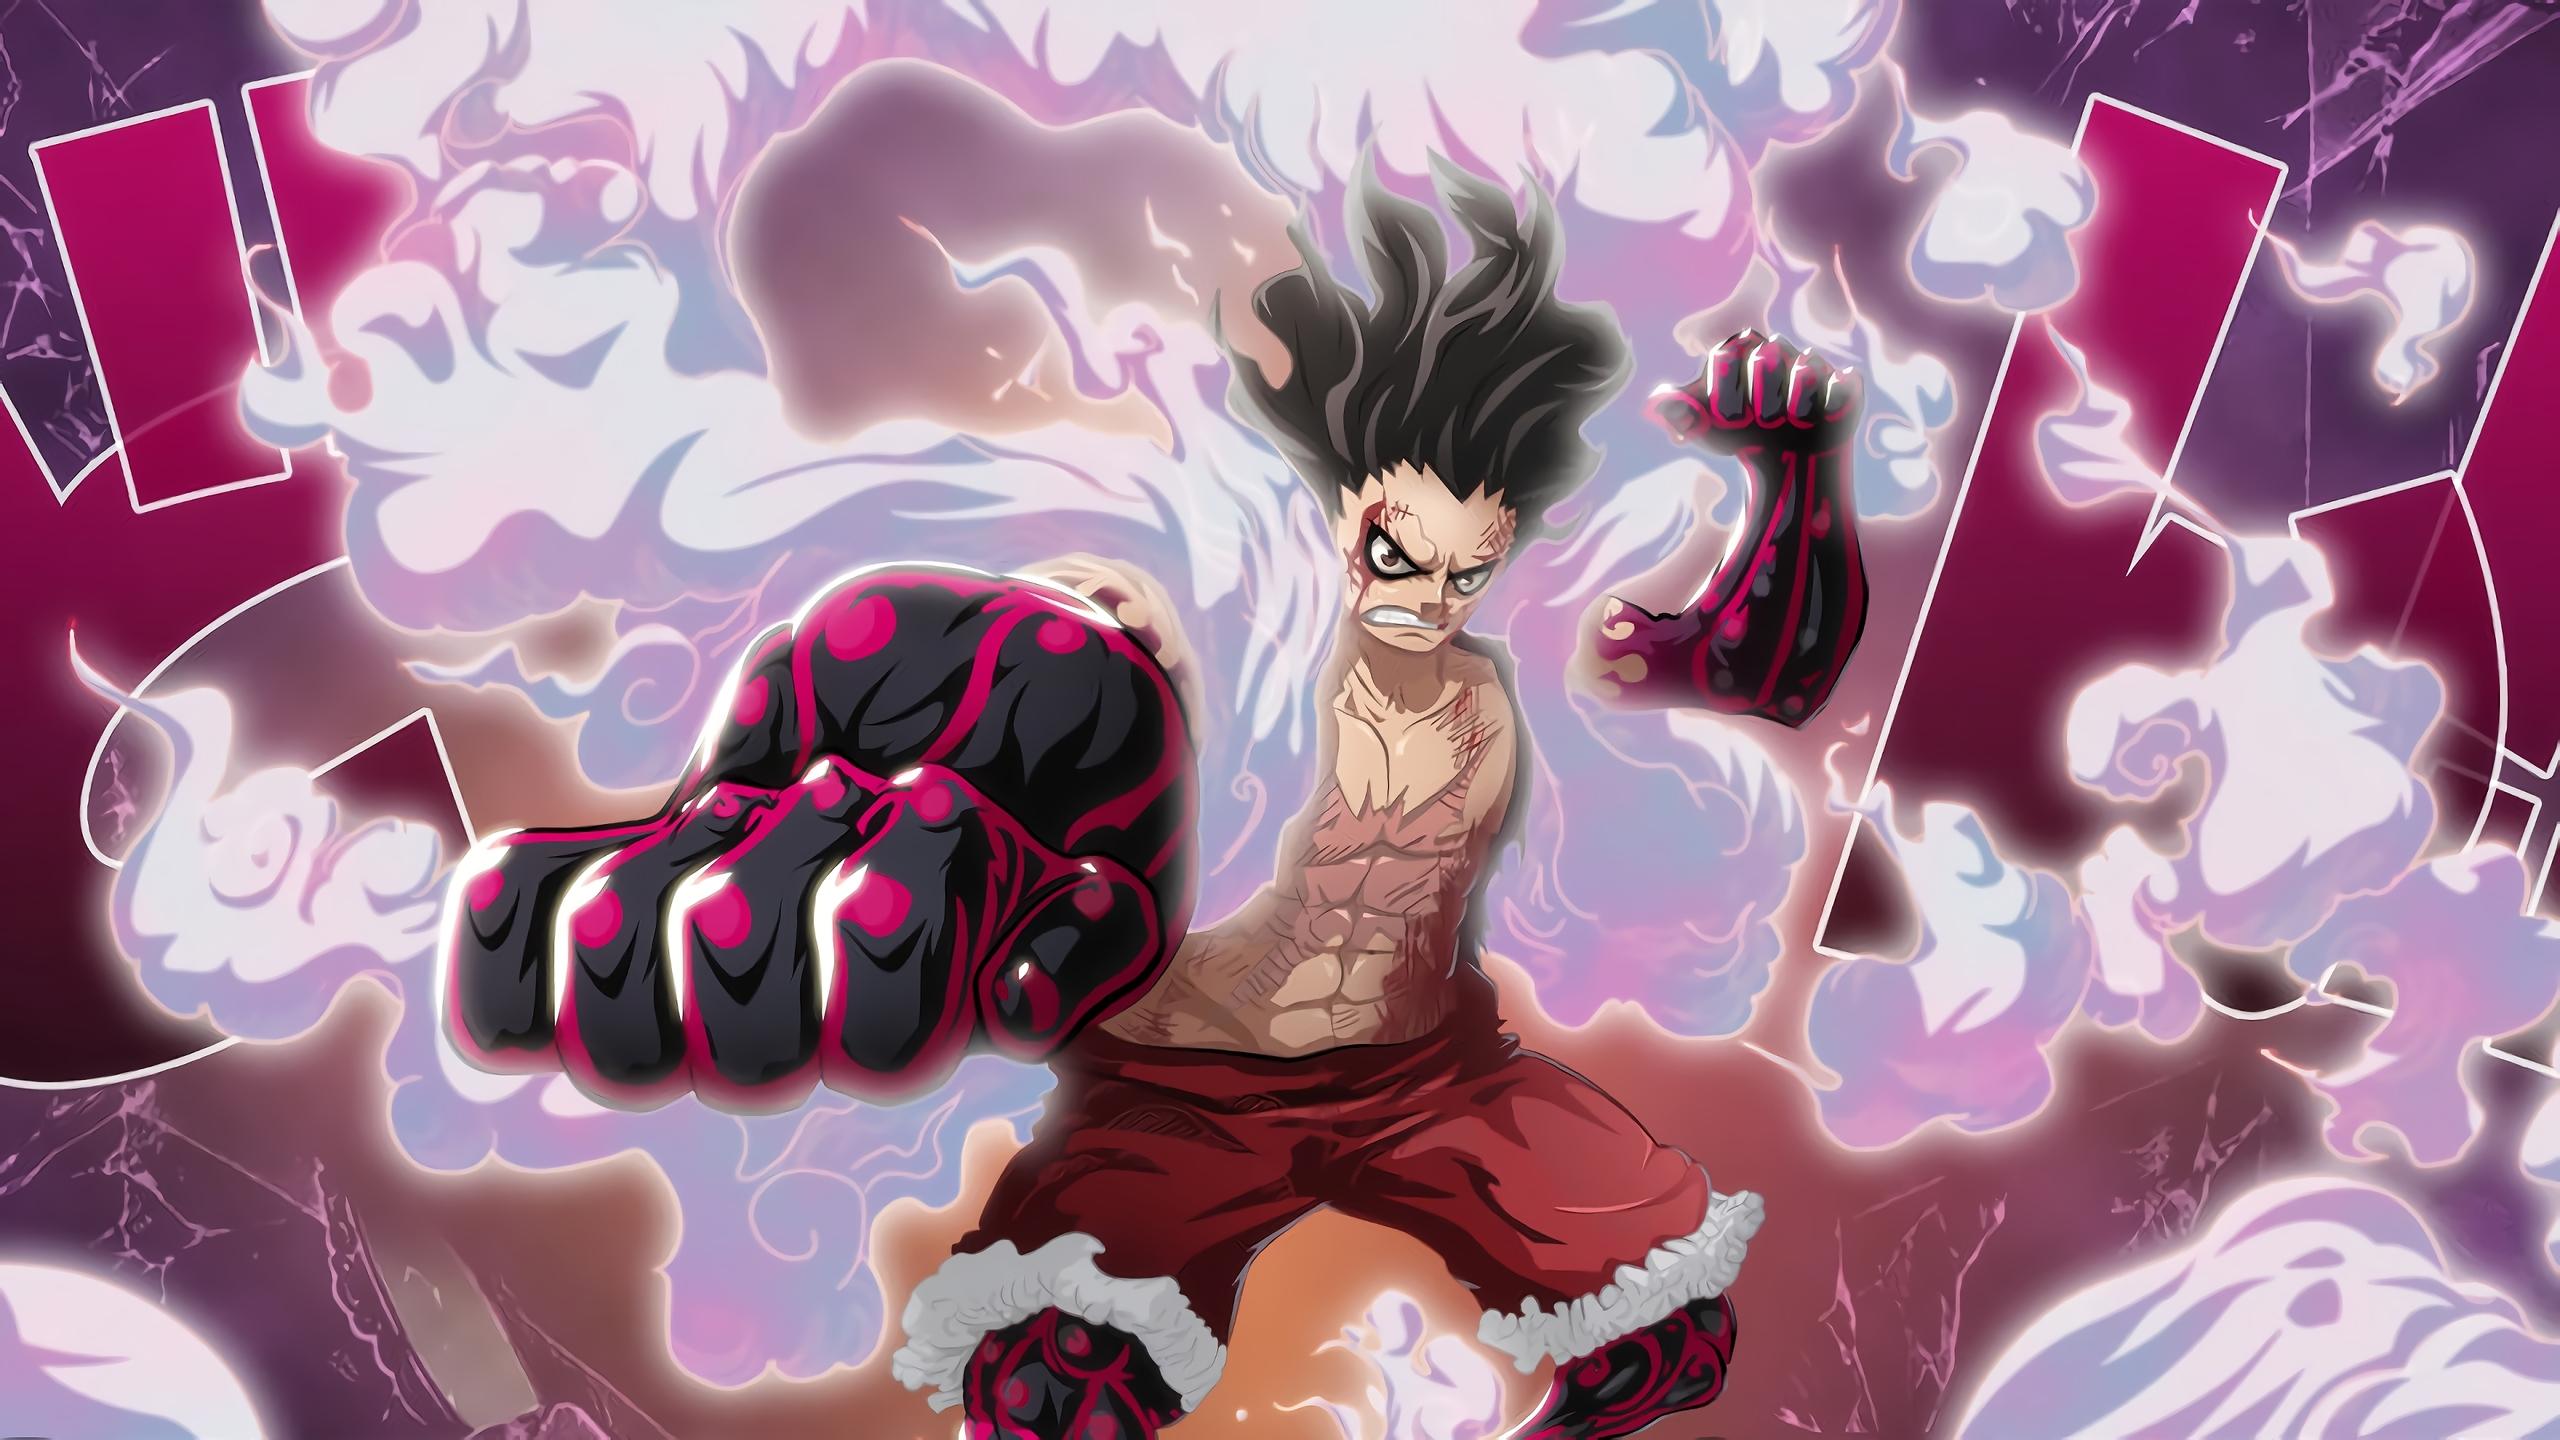 2560x1440 One Piece Monkey D Luffy 1440p Resolution Hd 4k